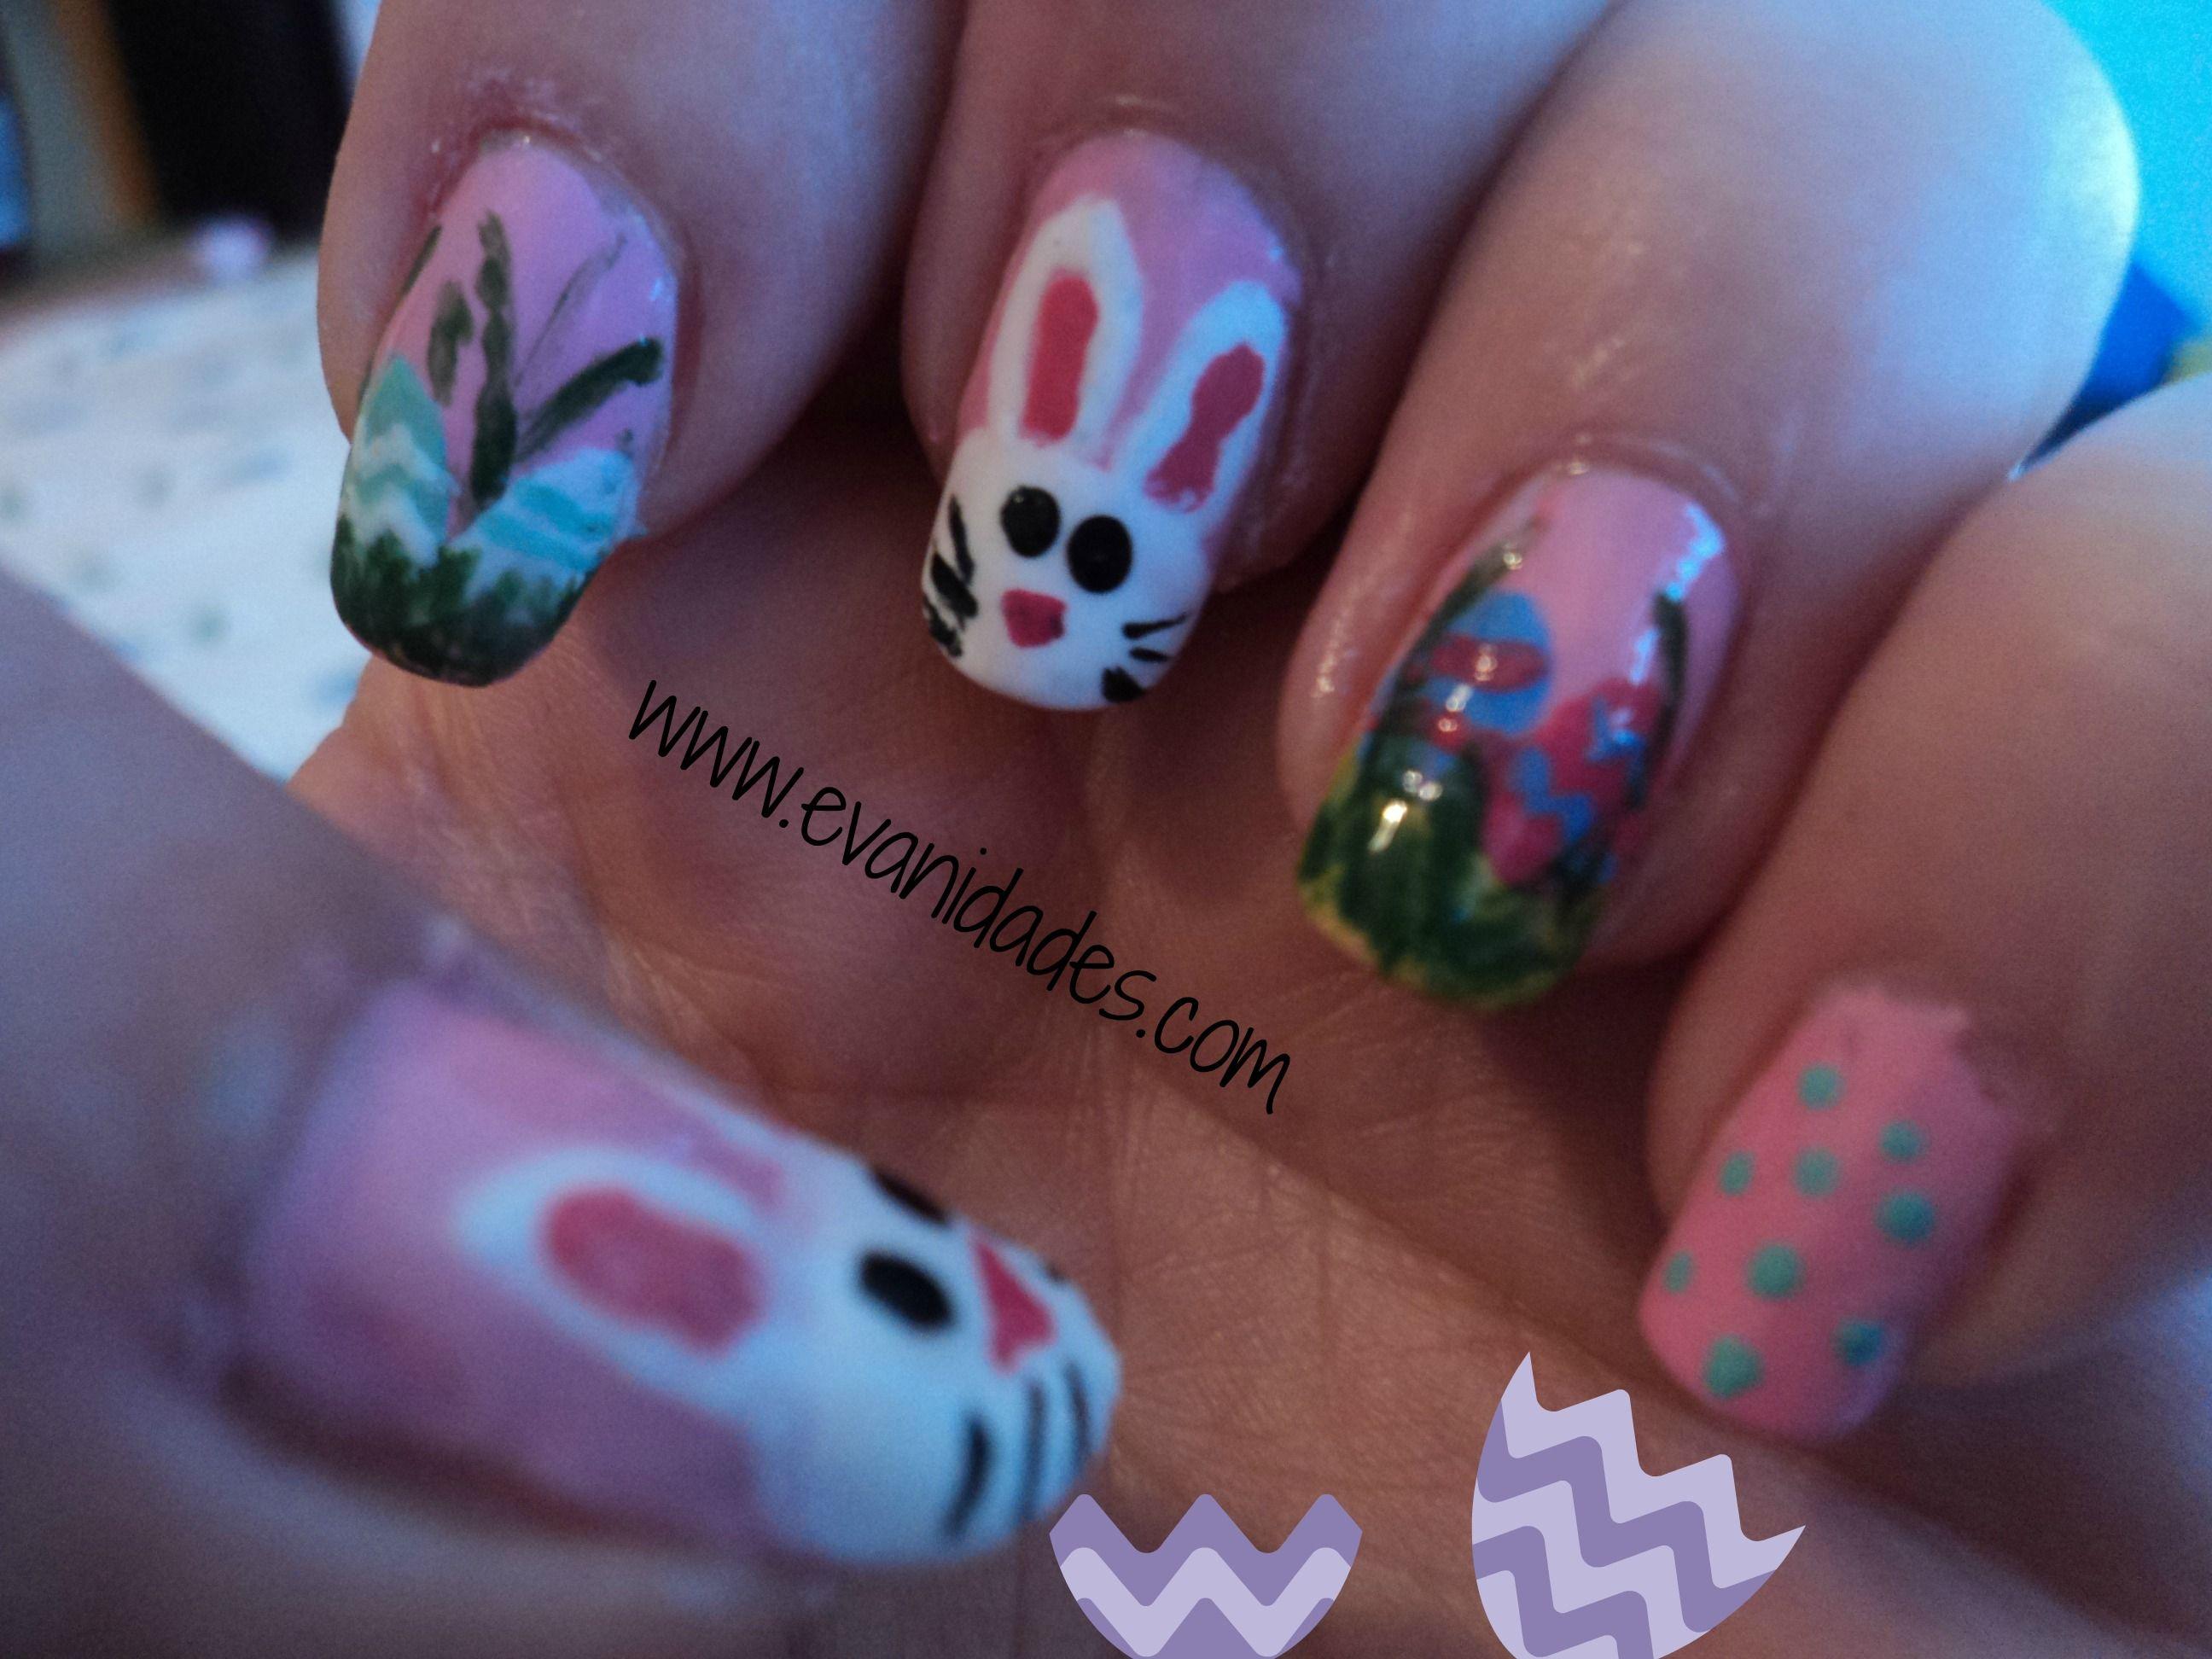 huevos de pascua en las uñas | Easter Bunny Nail Art | Pinterest ...